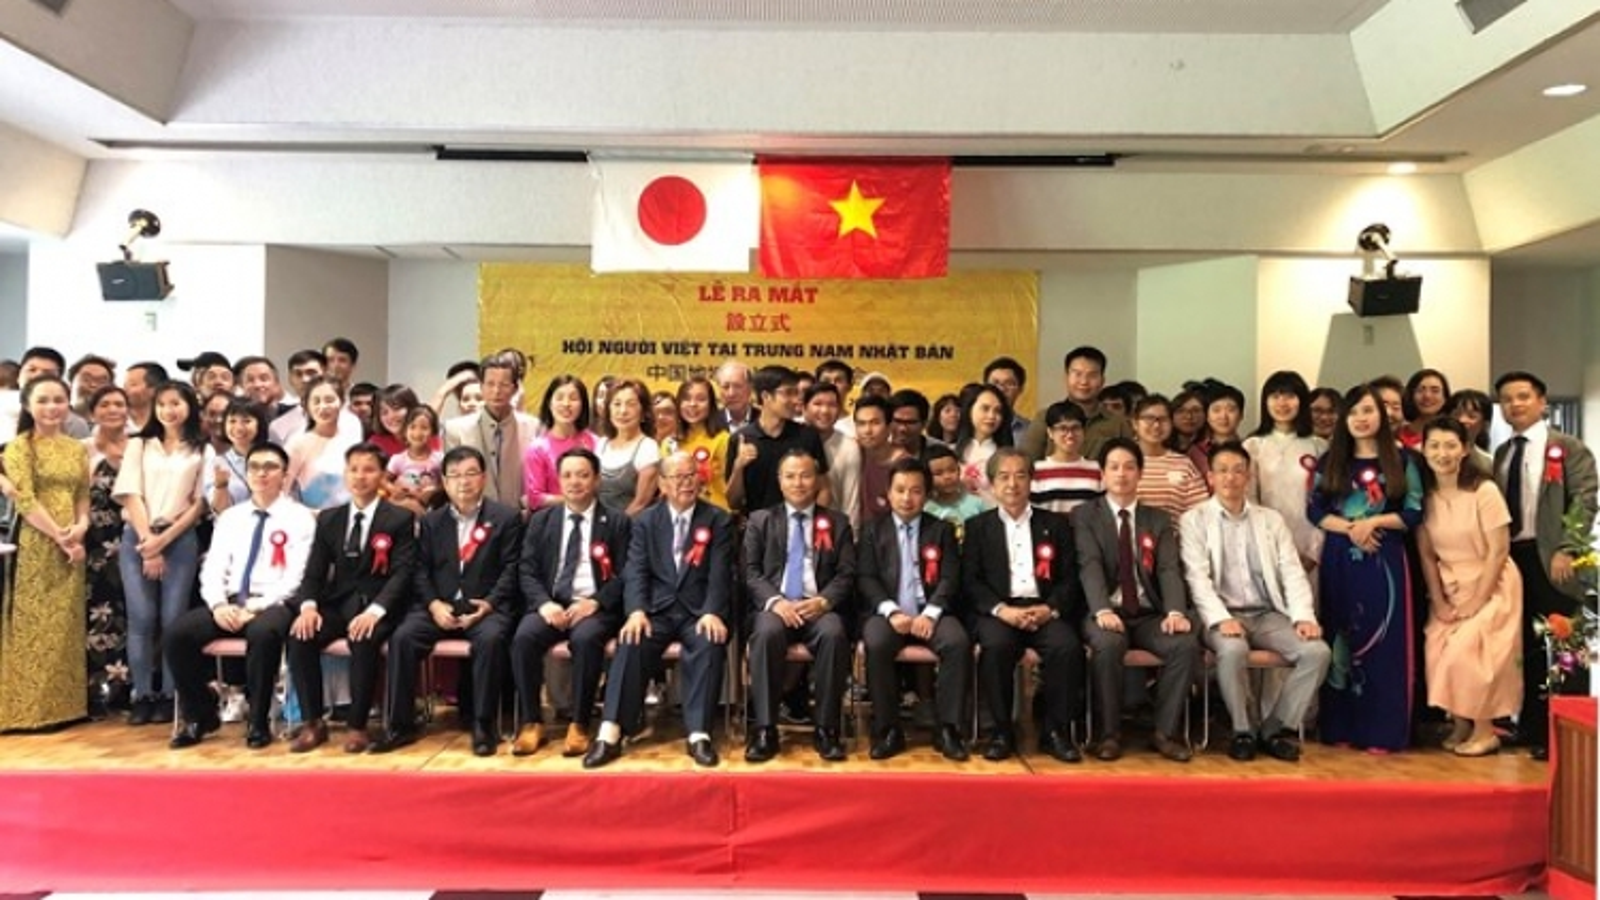 Vietnamese people association established in central-southern Japan